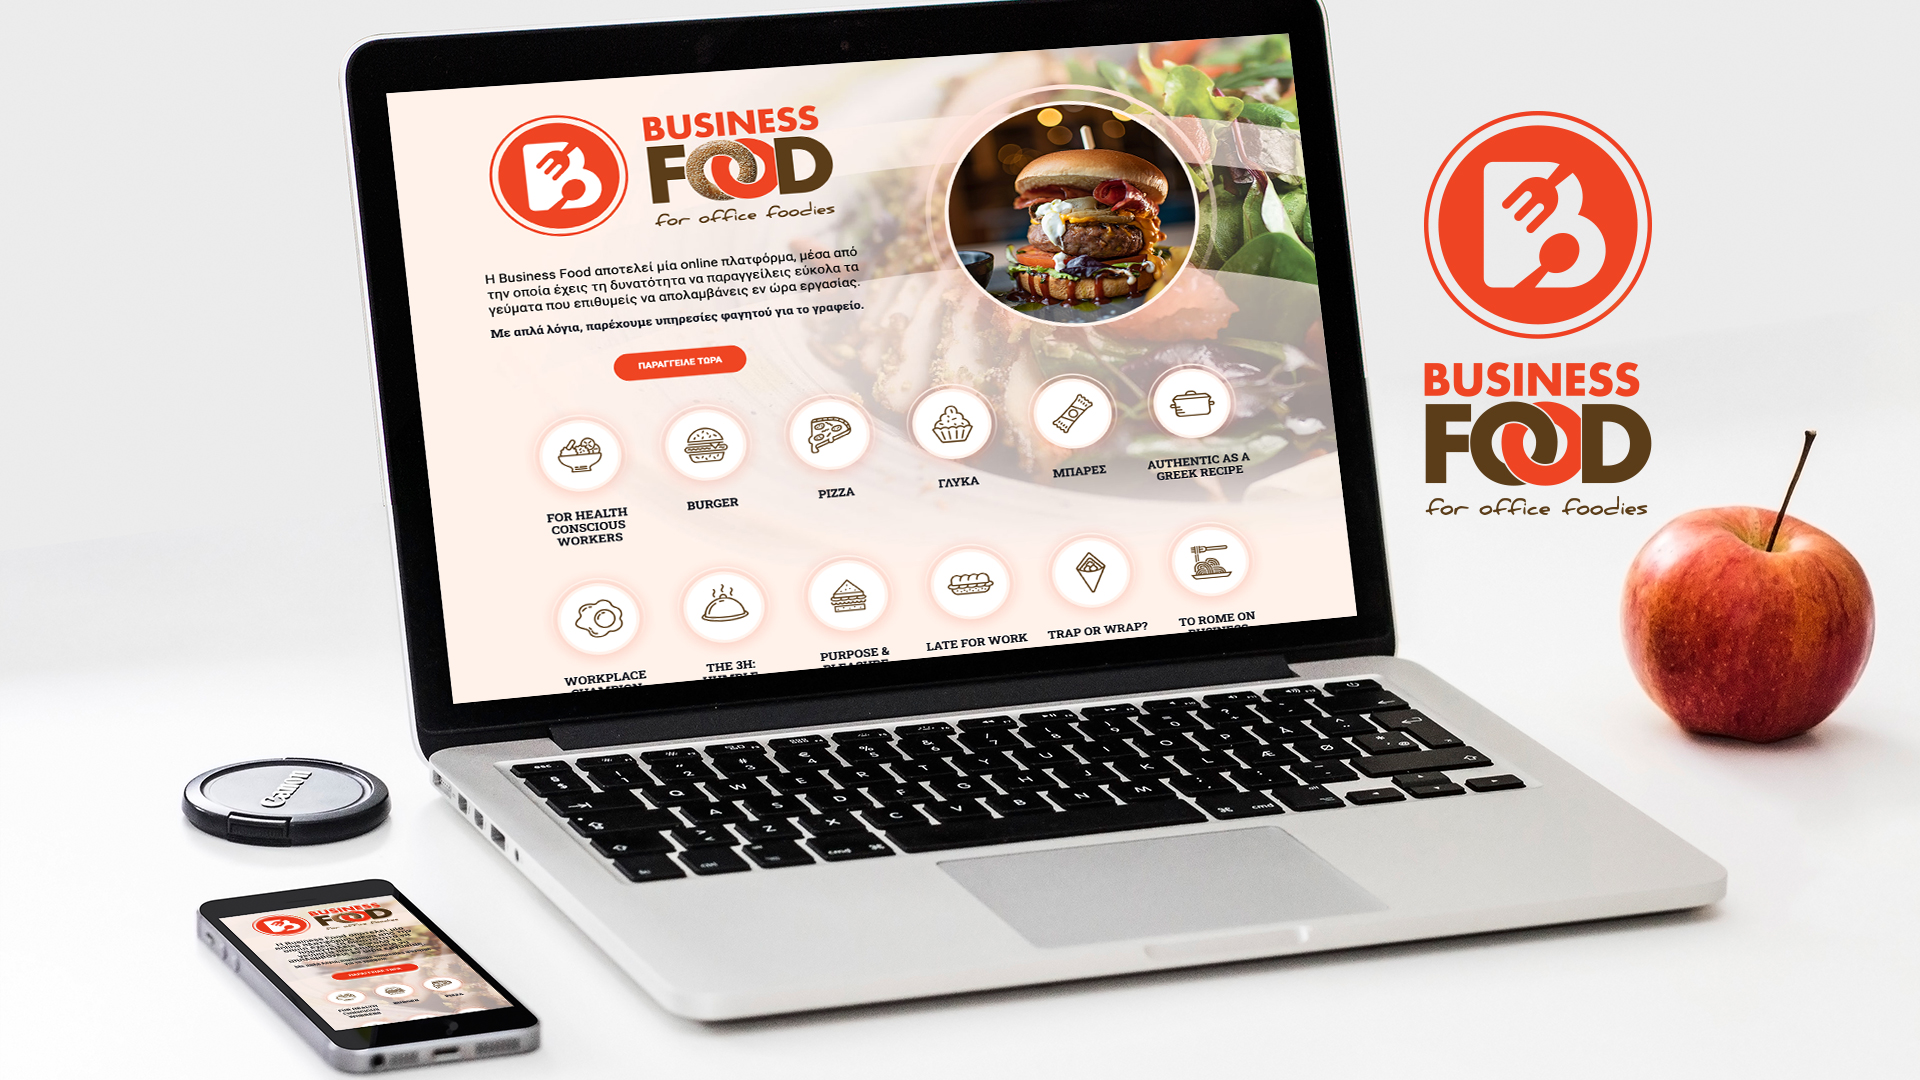 business-food-L